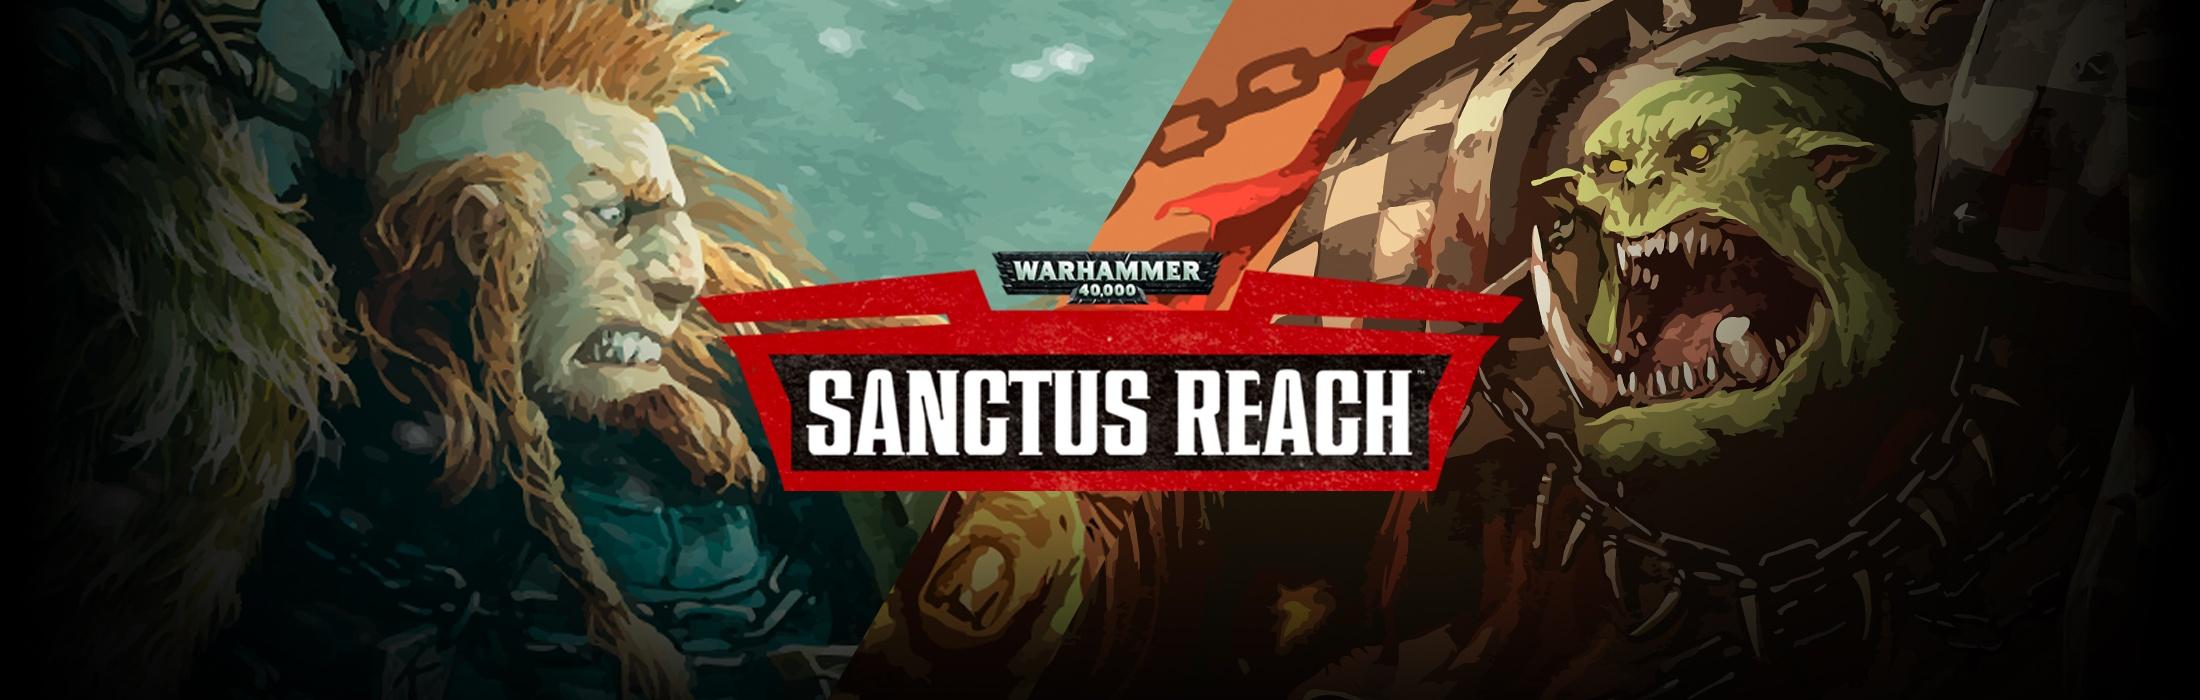 Warhammer 40,000: Sanctus Reach [Pc, Fanatical]